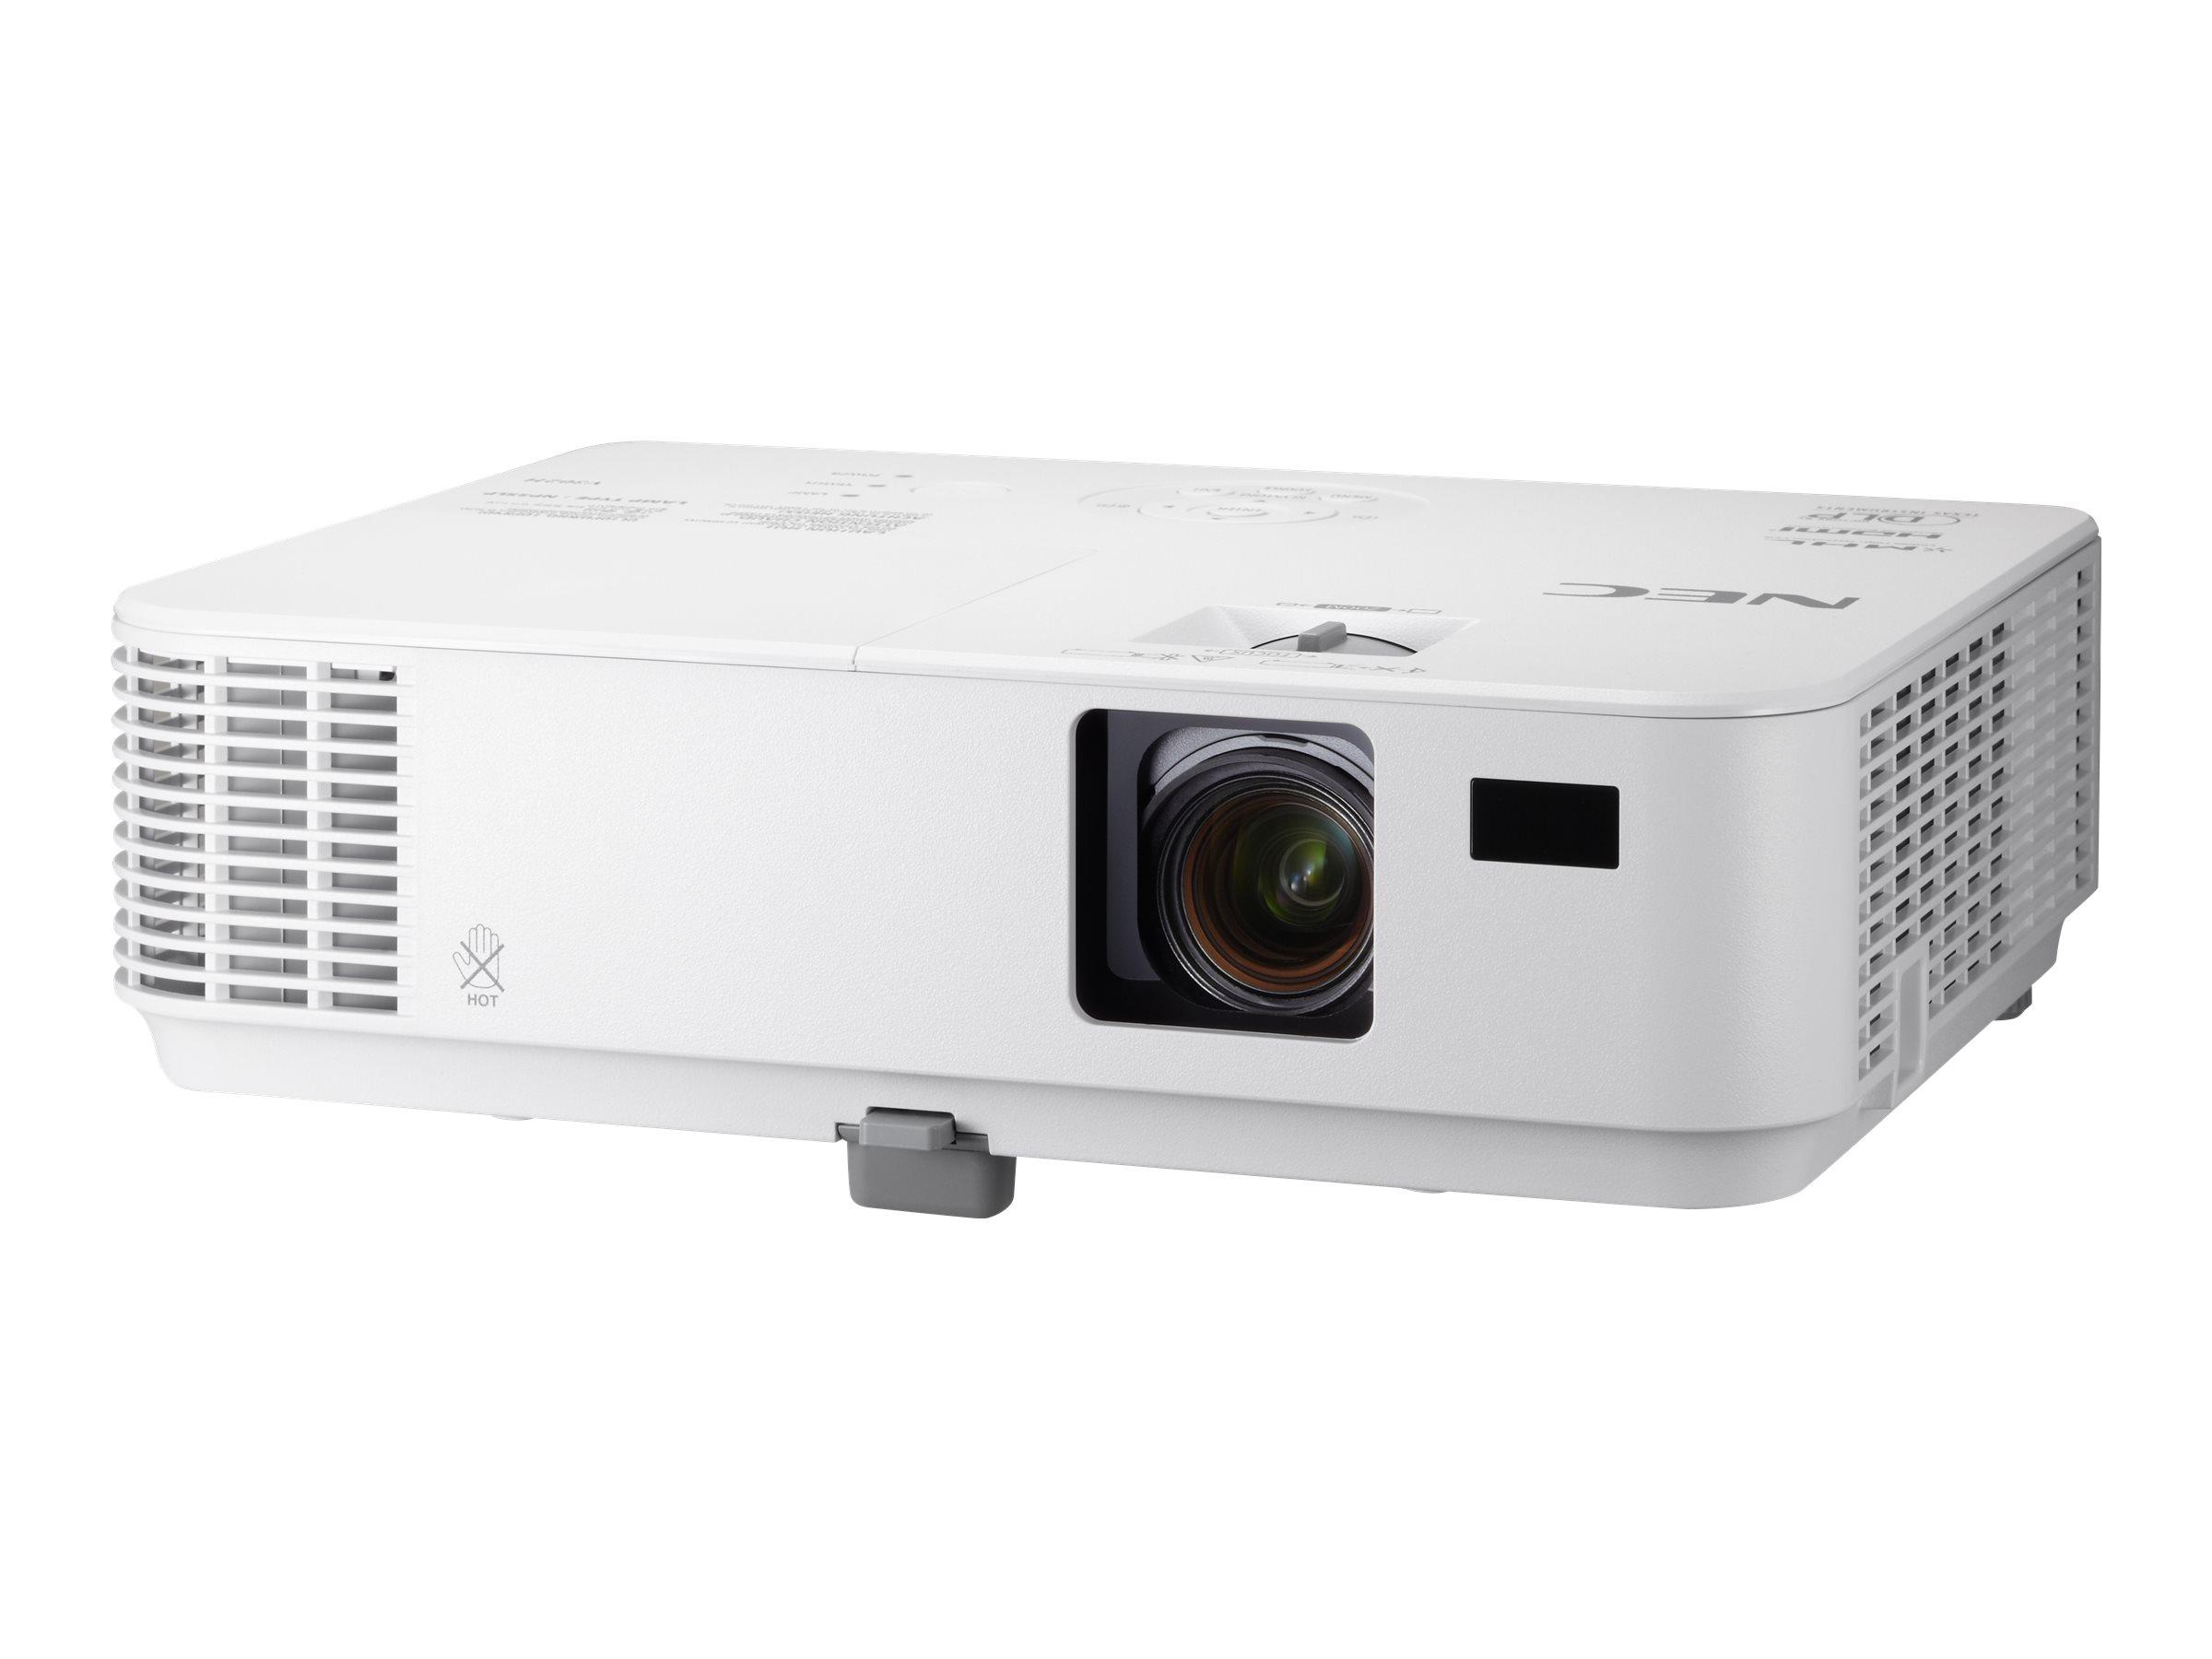 NEC V302X PROYECTOR DLP 3D 3000 ANSI LUMENS XGA 10